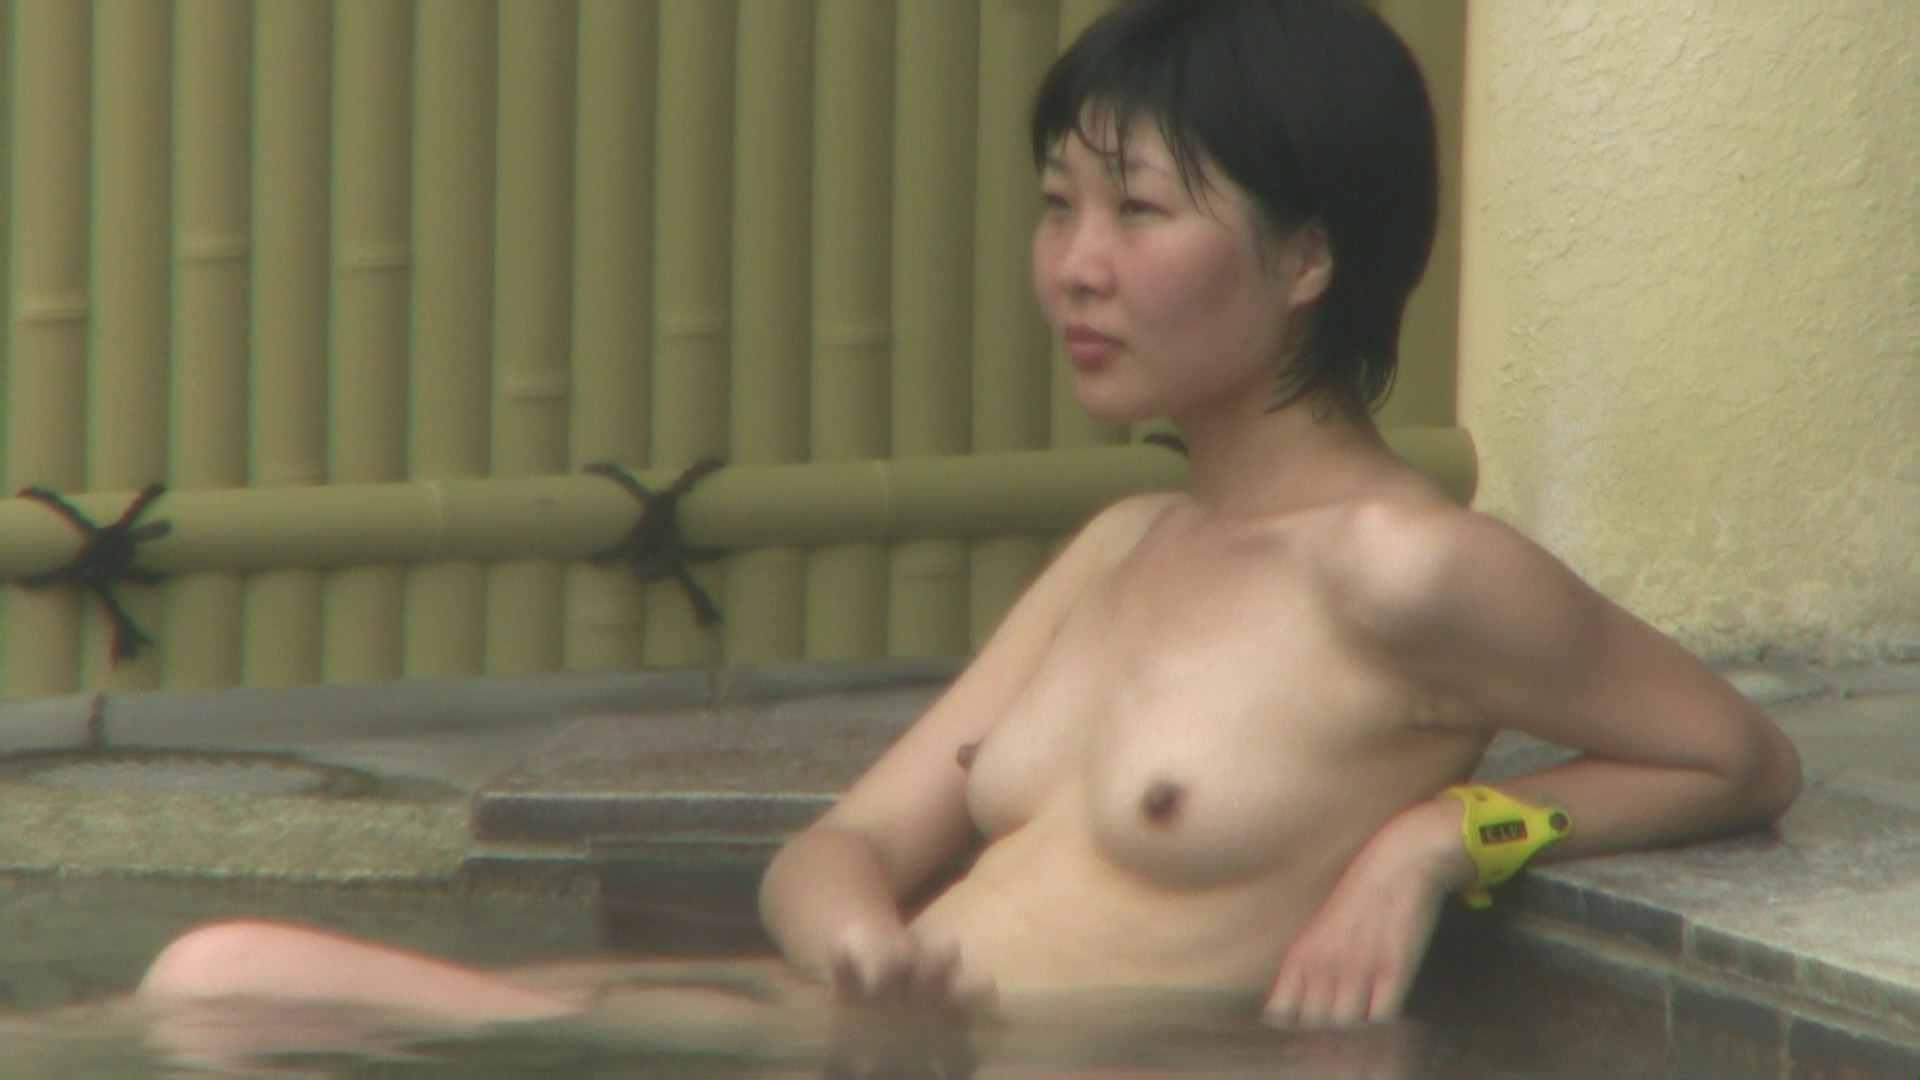 Aquaな露天風呂Vol.74【VIP限定】 OLセックス | 露天  68画像 16